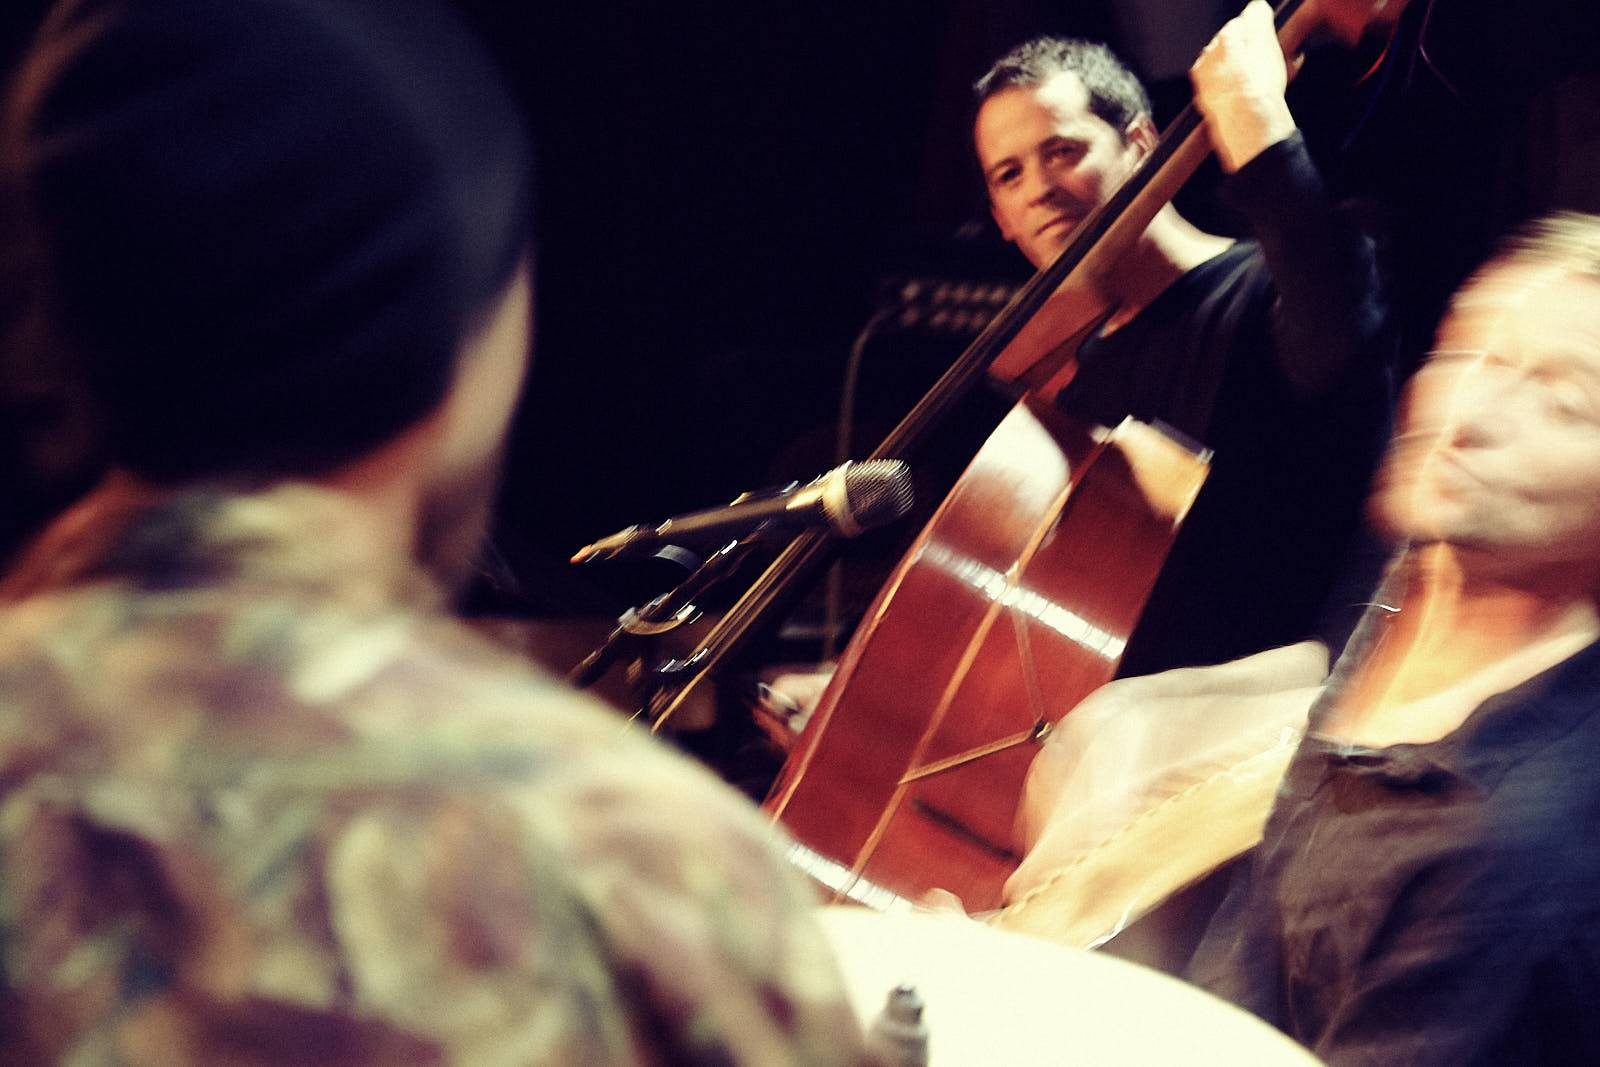 9 oct: concert à Langoiran de De La Crau (Marseille)